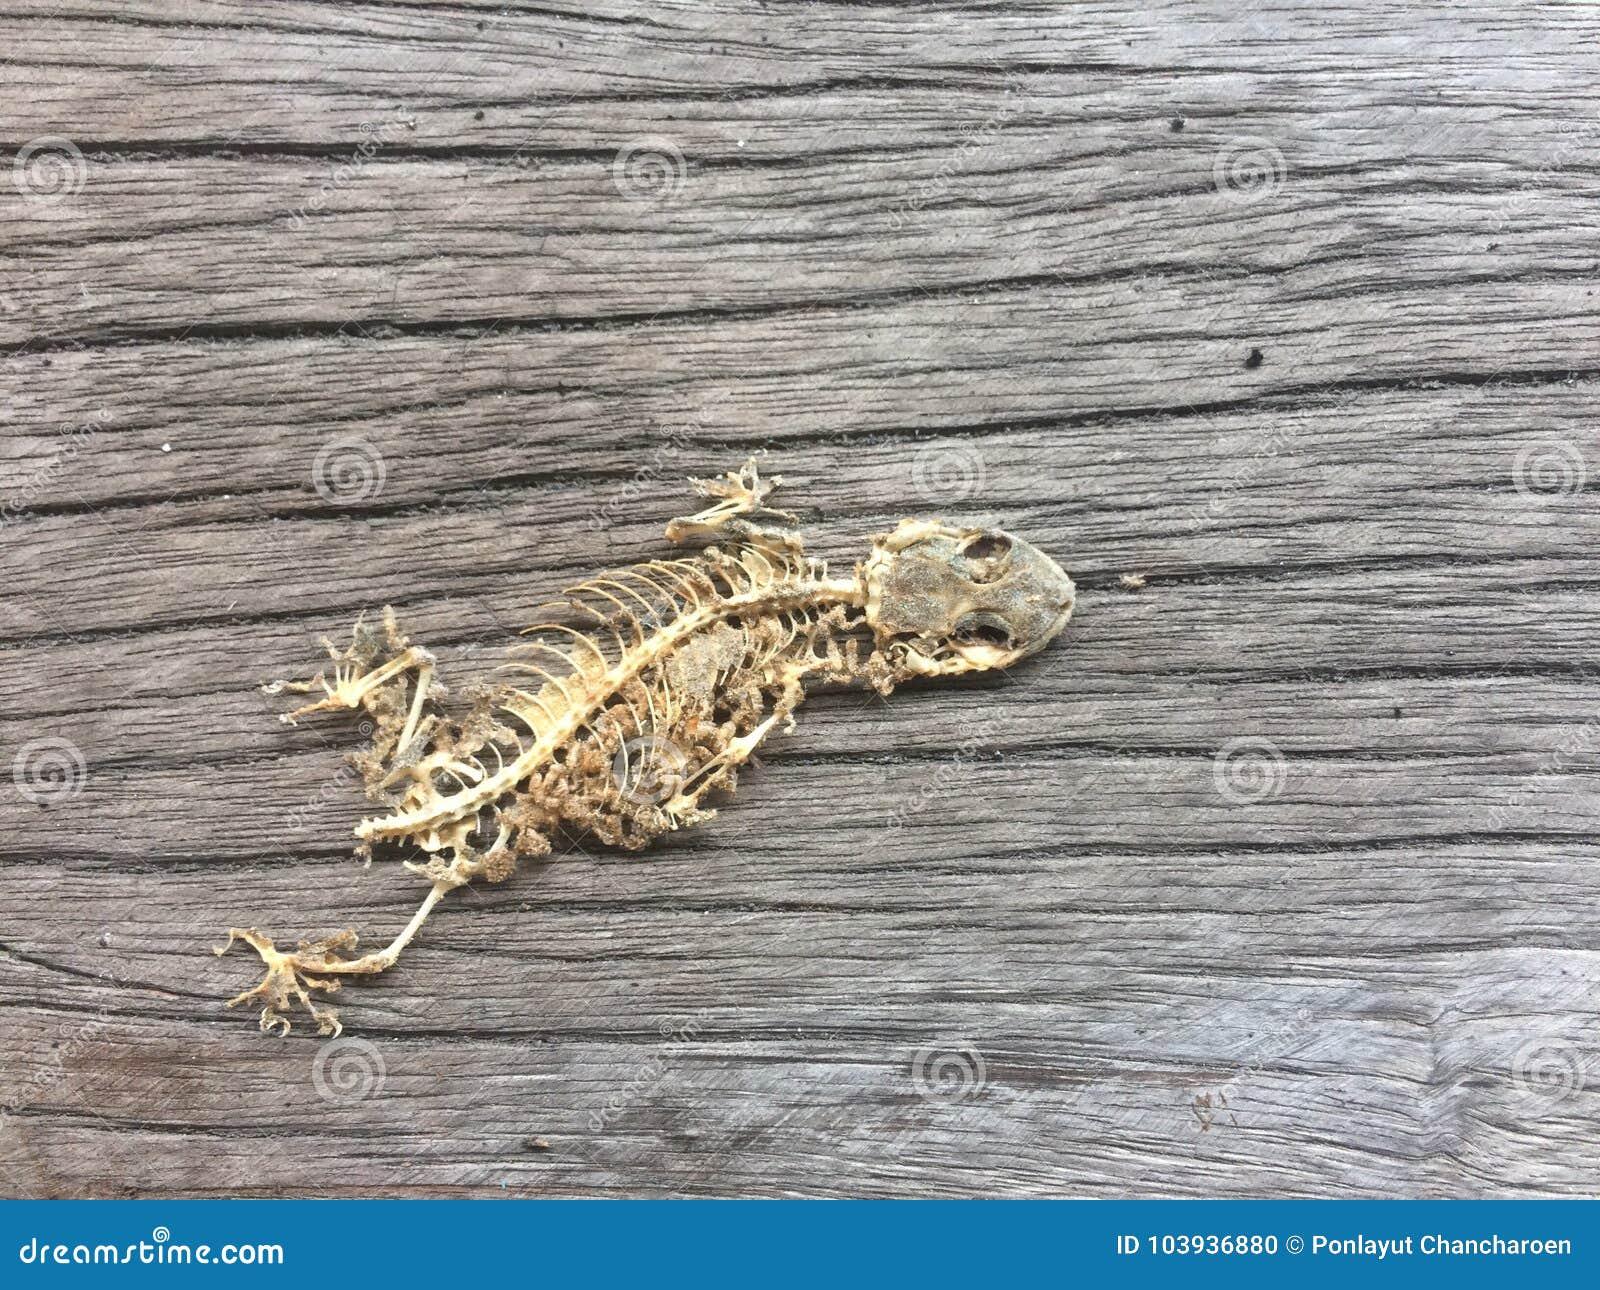 Skeleton of reptile stock photo  Image of ashes, bone